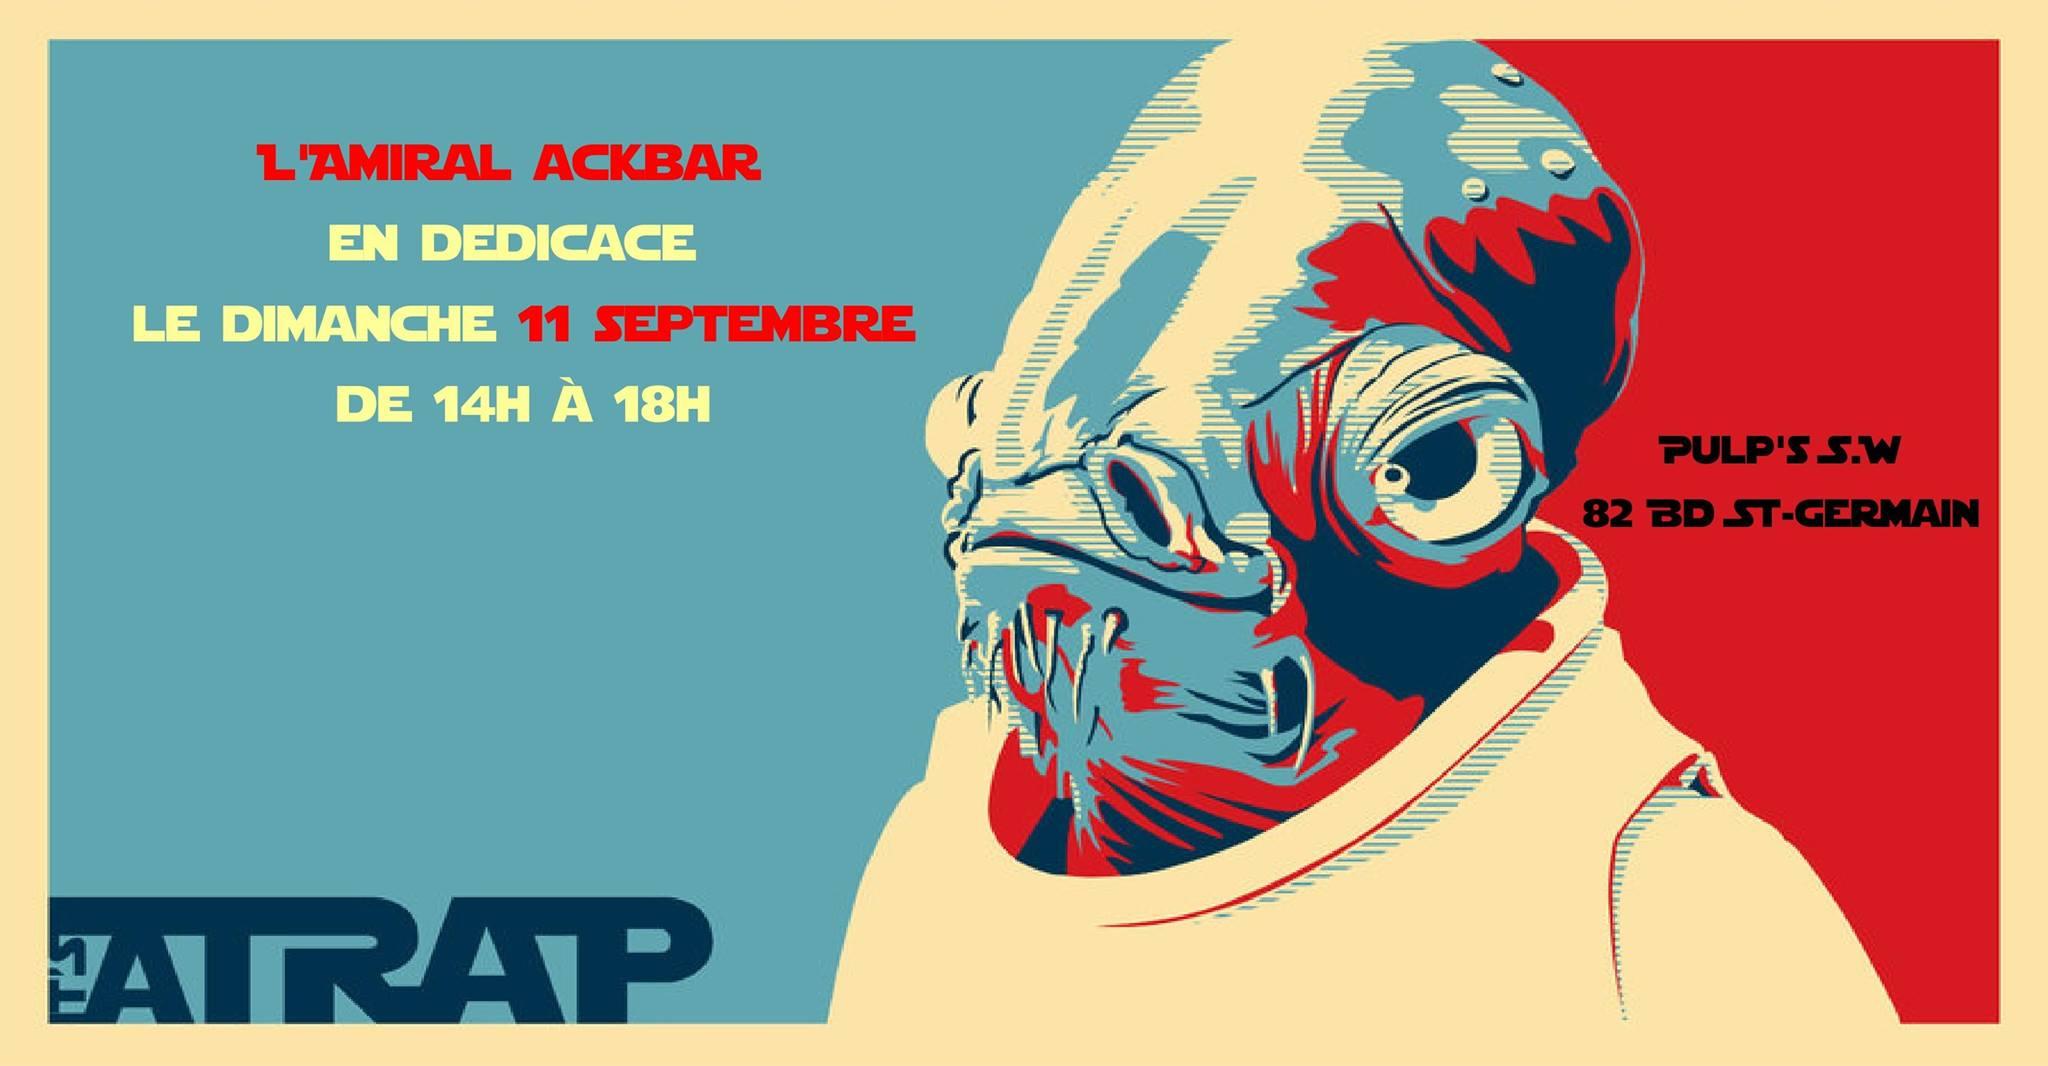 Dédicace Ackbar